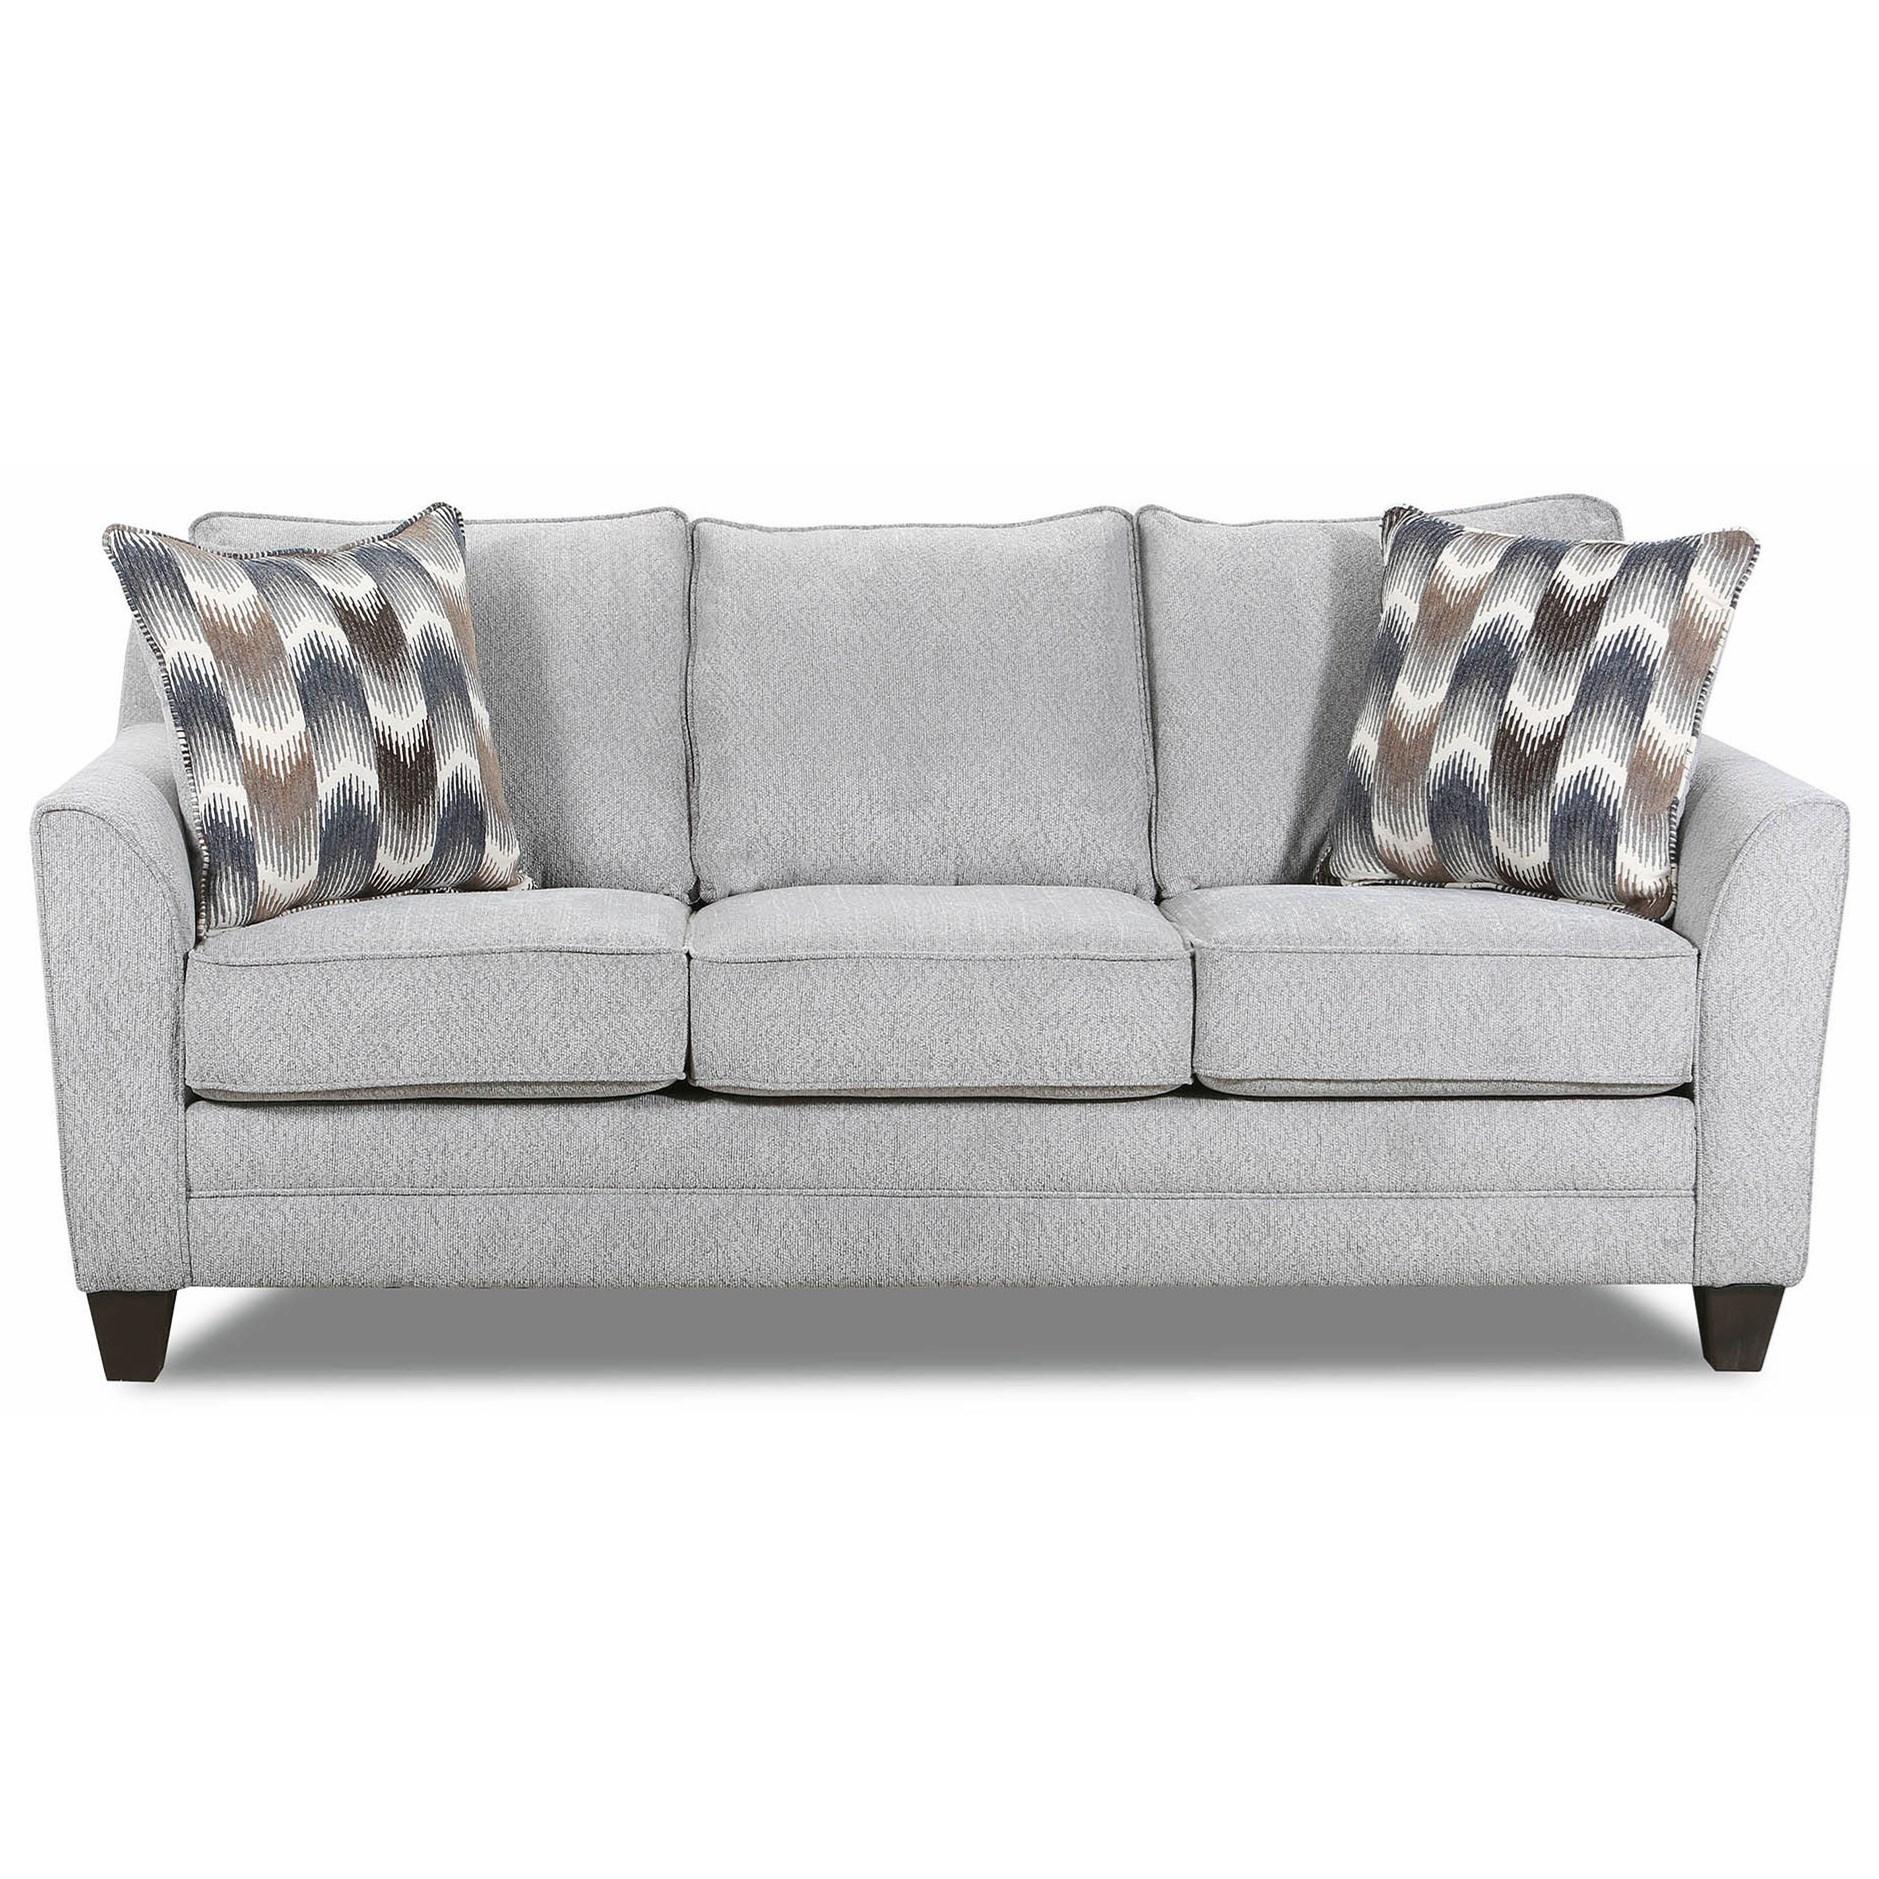 2013 Sofa by Lane at Story & Lee Furniture